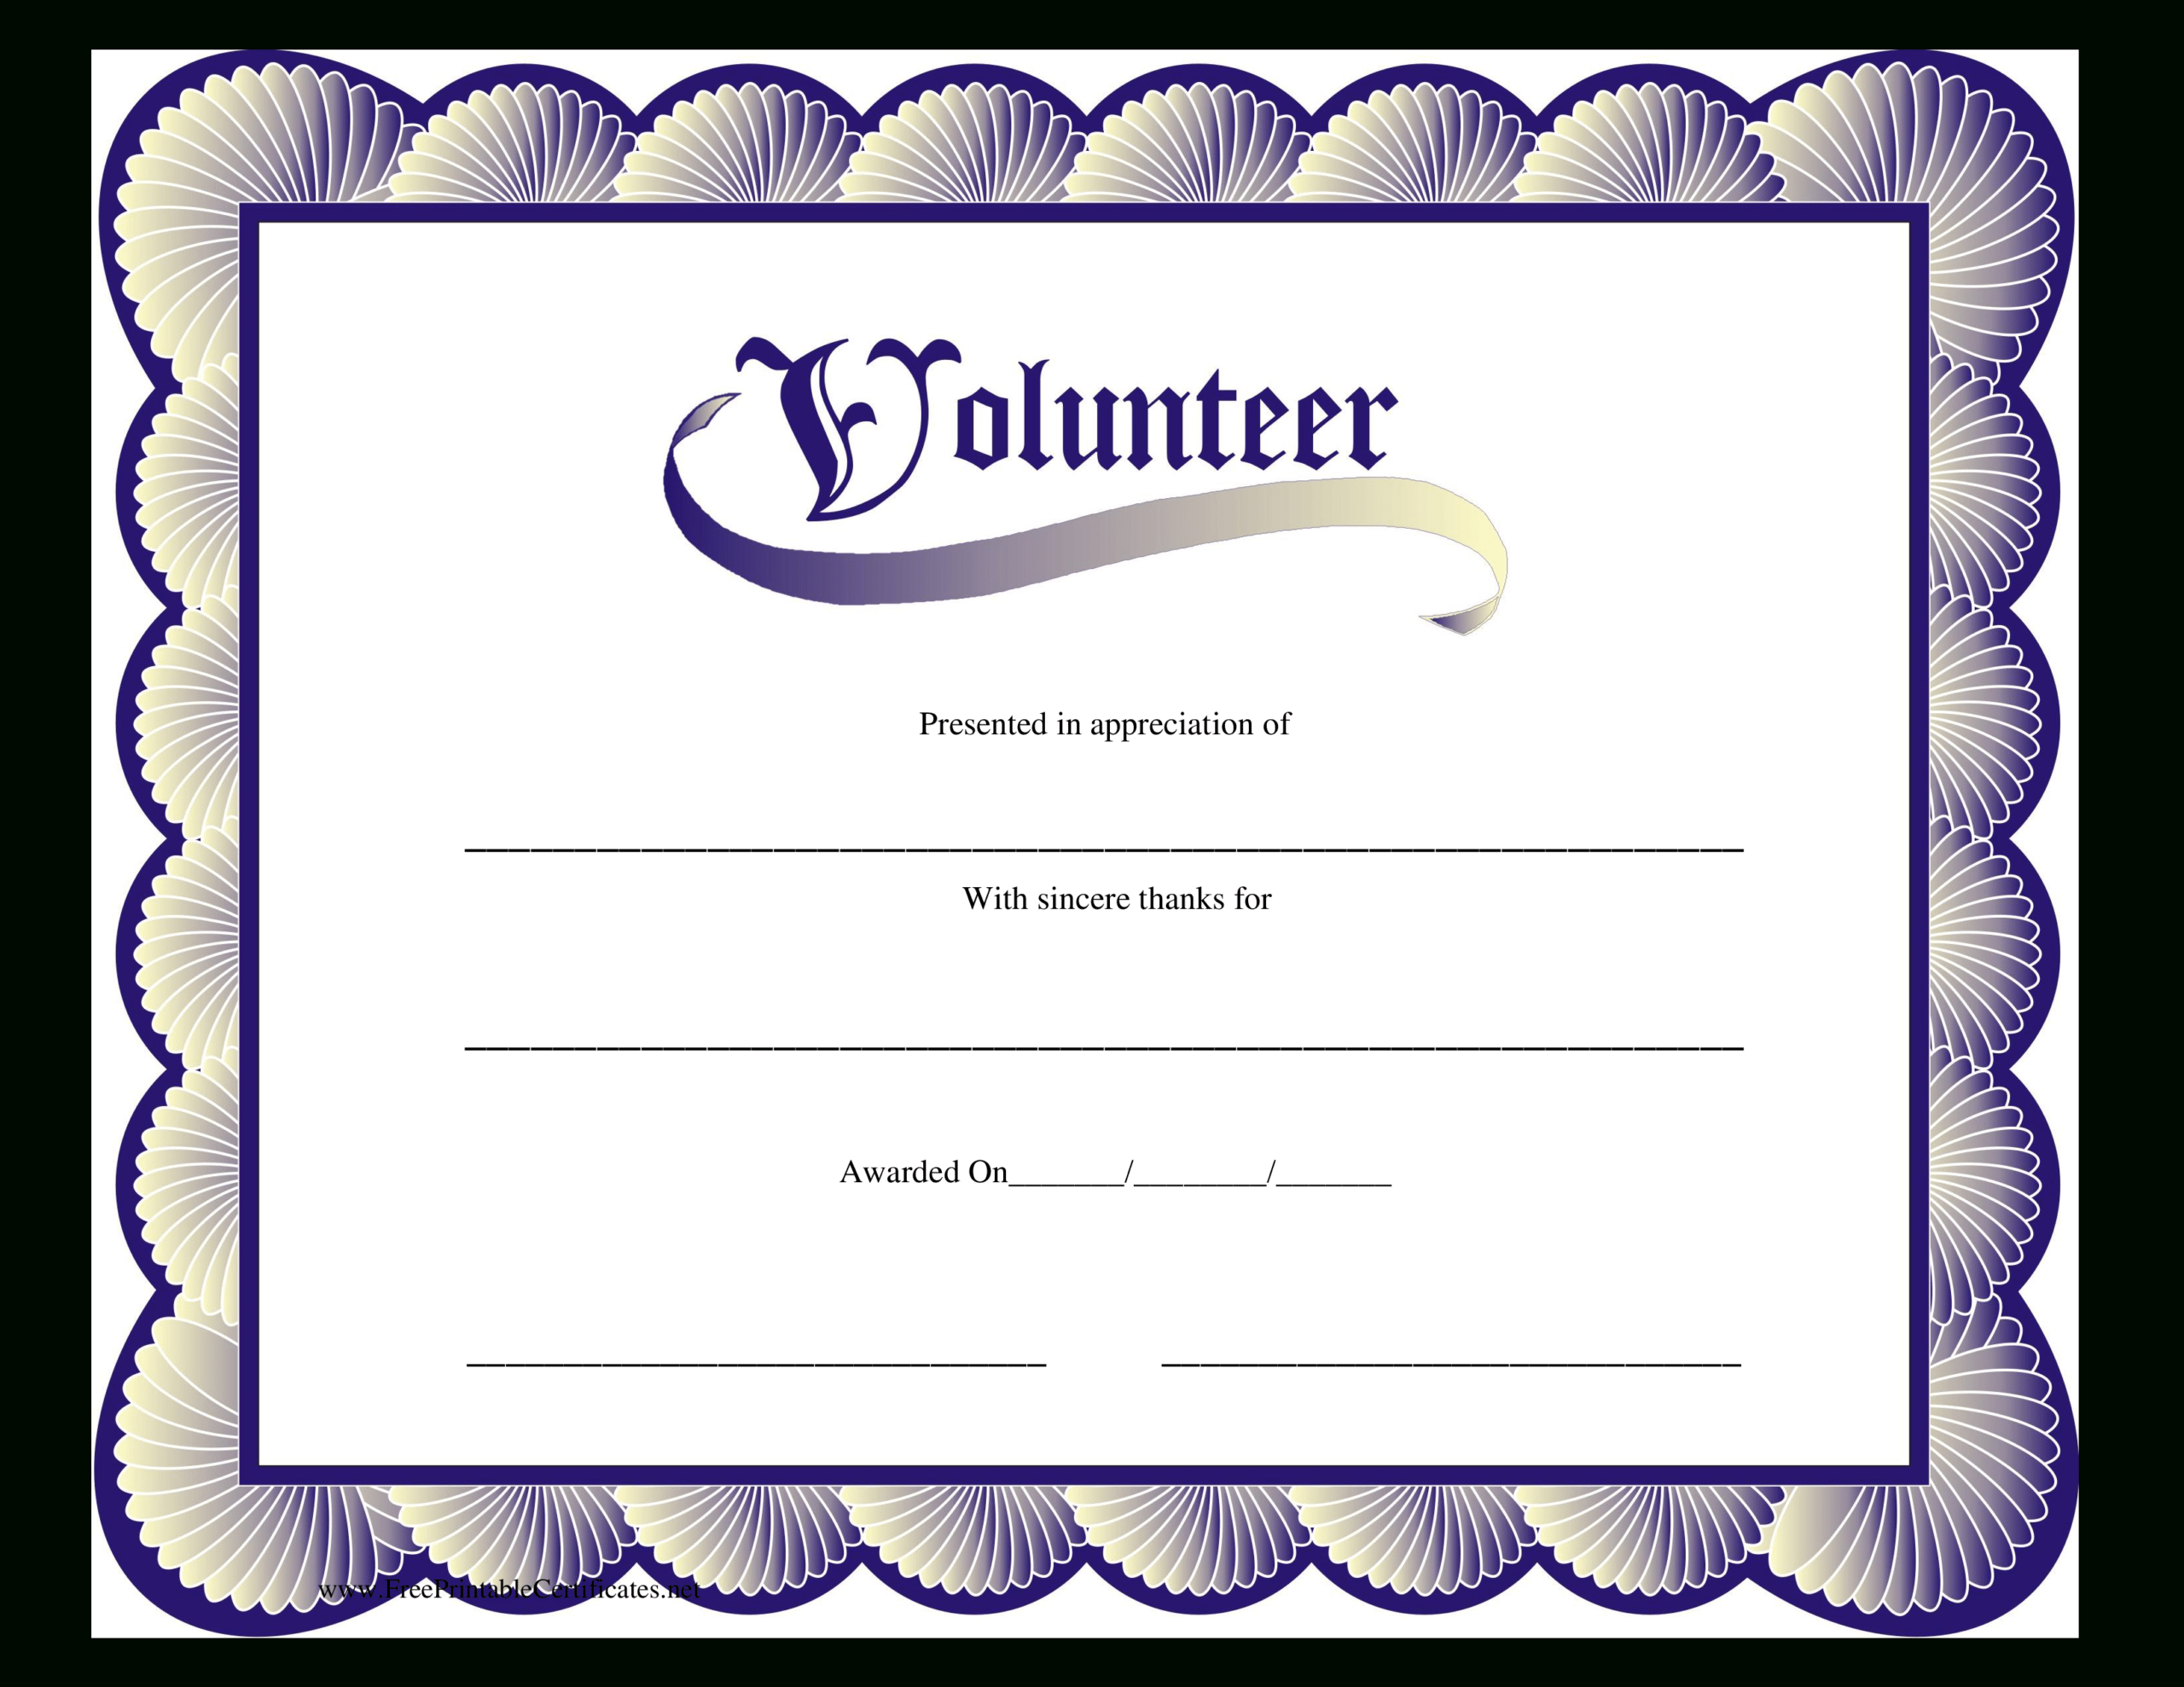 Volunteer Certificate | Templates At Allbusinesstemplates Inside Volunteer Certificate Template